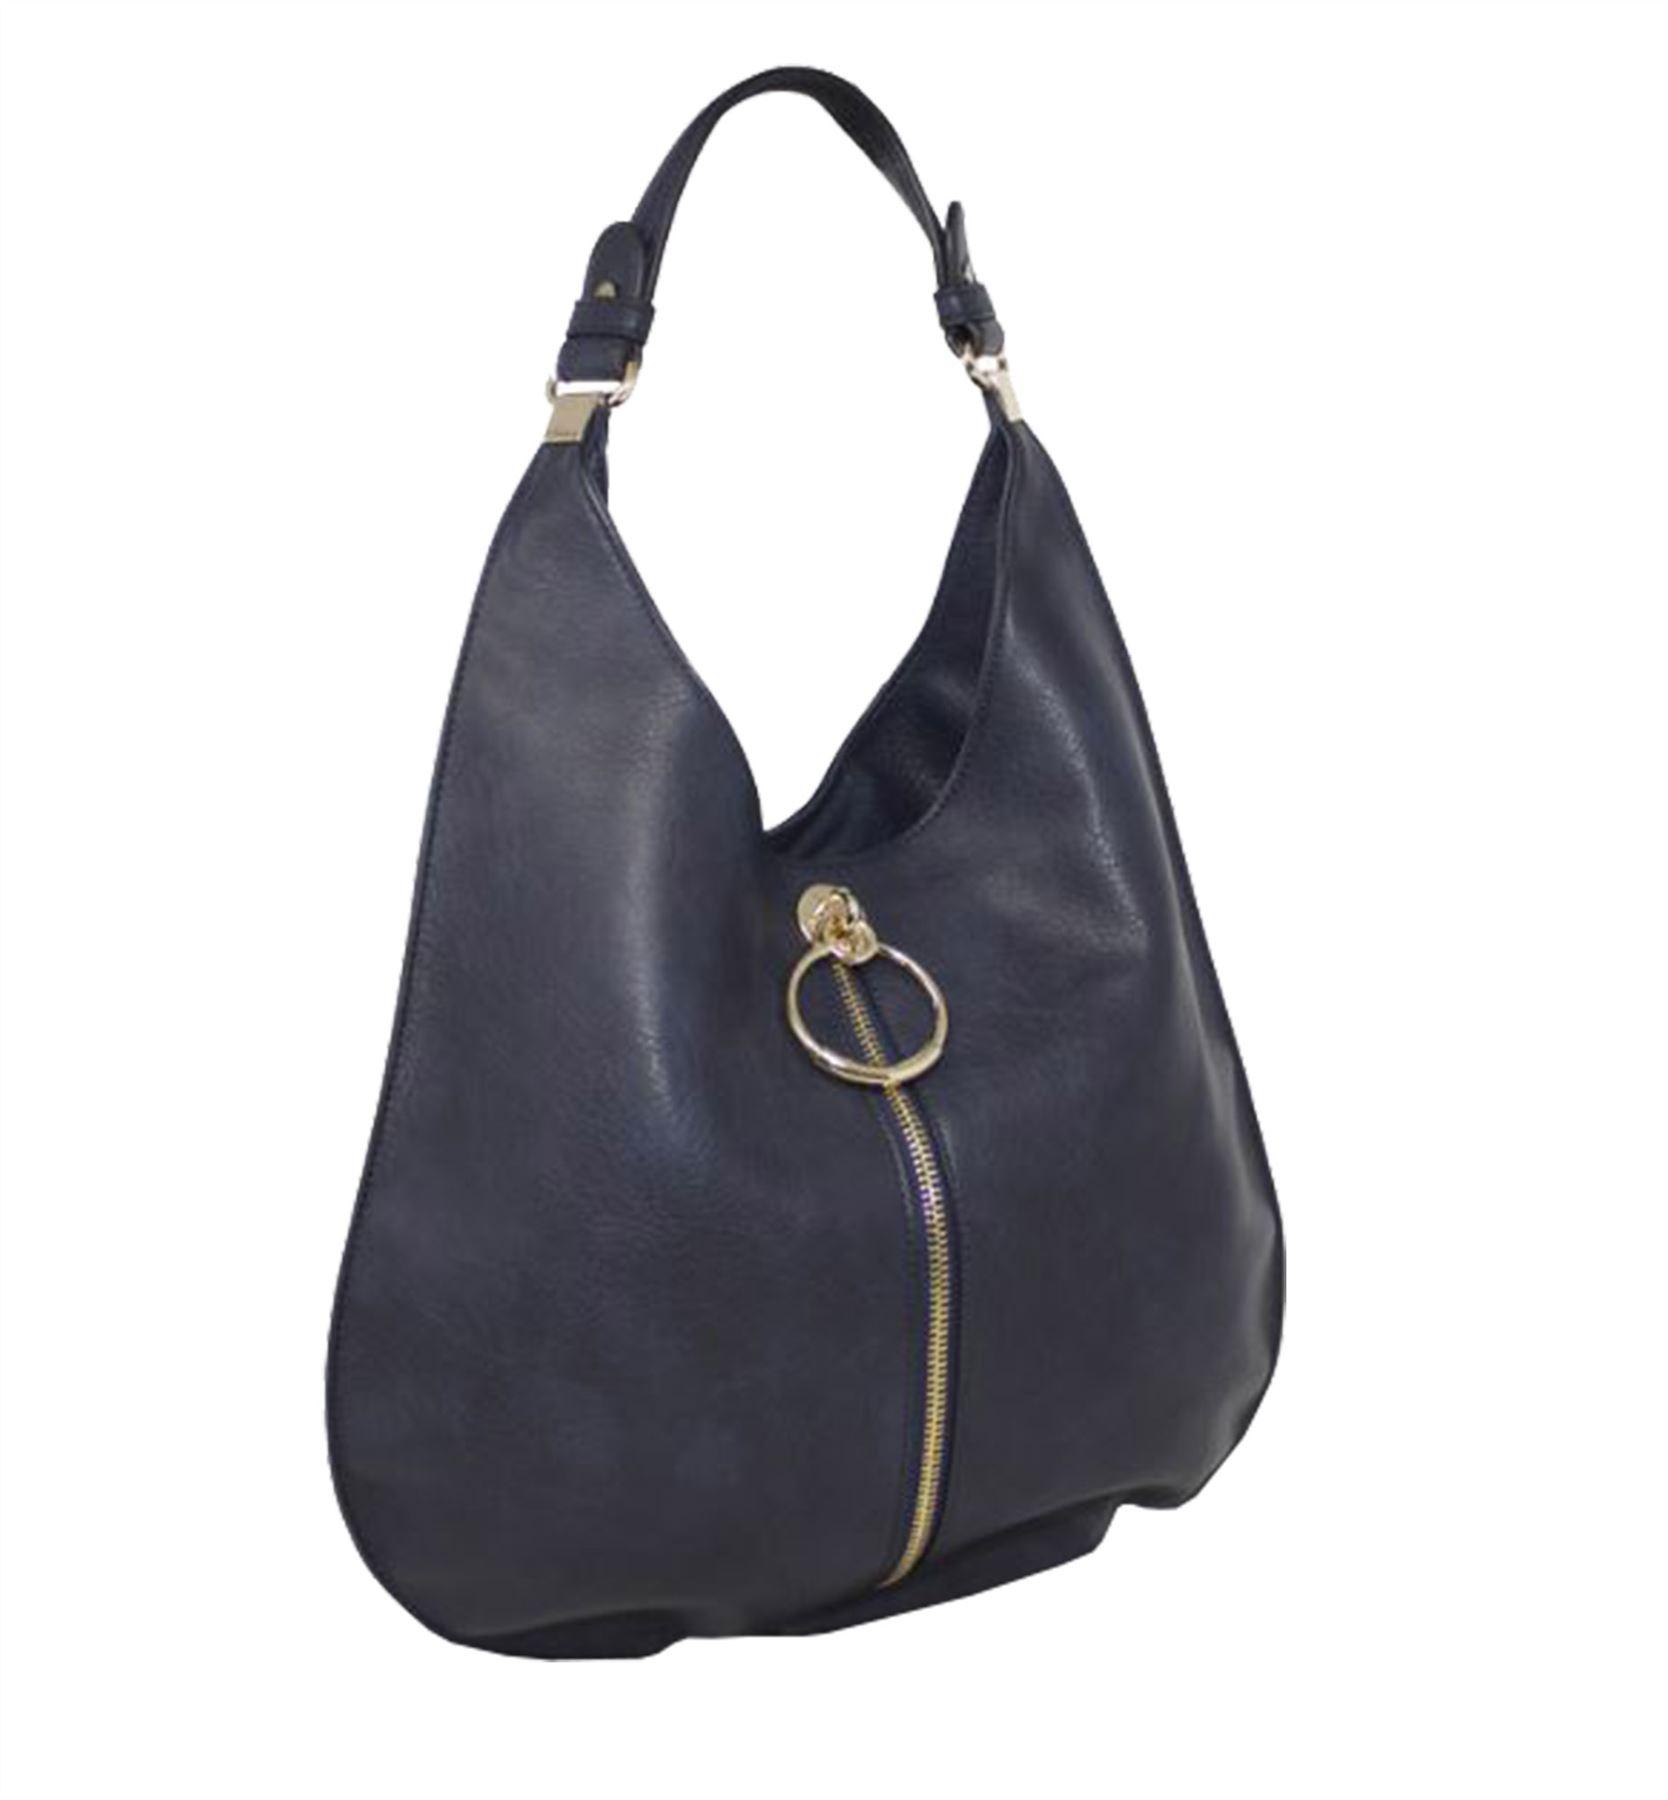 New Faux Leather Hoop Zip Detail Ladies Fashion Hobo Shoulder Bag